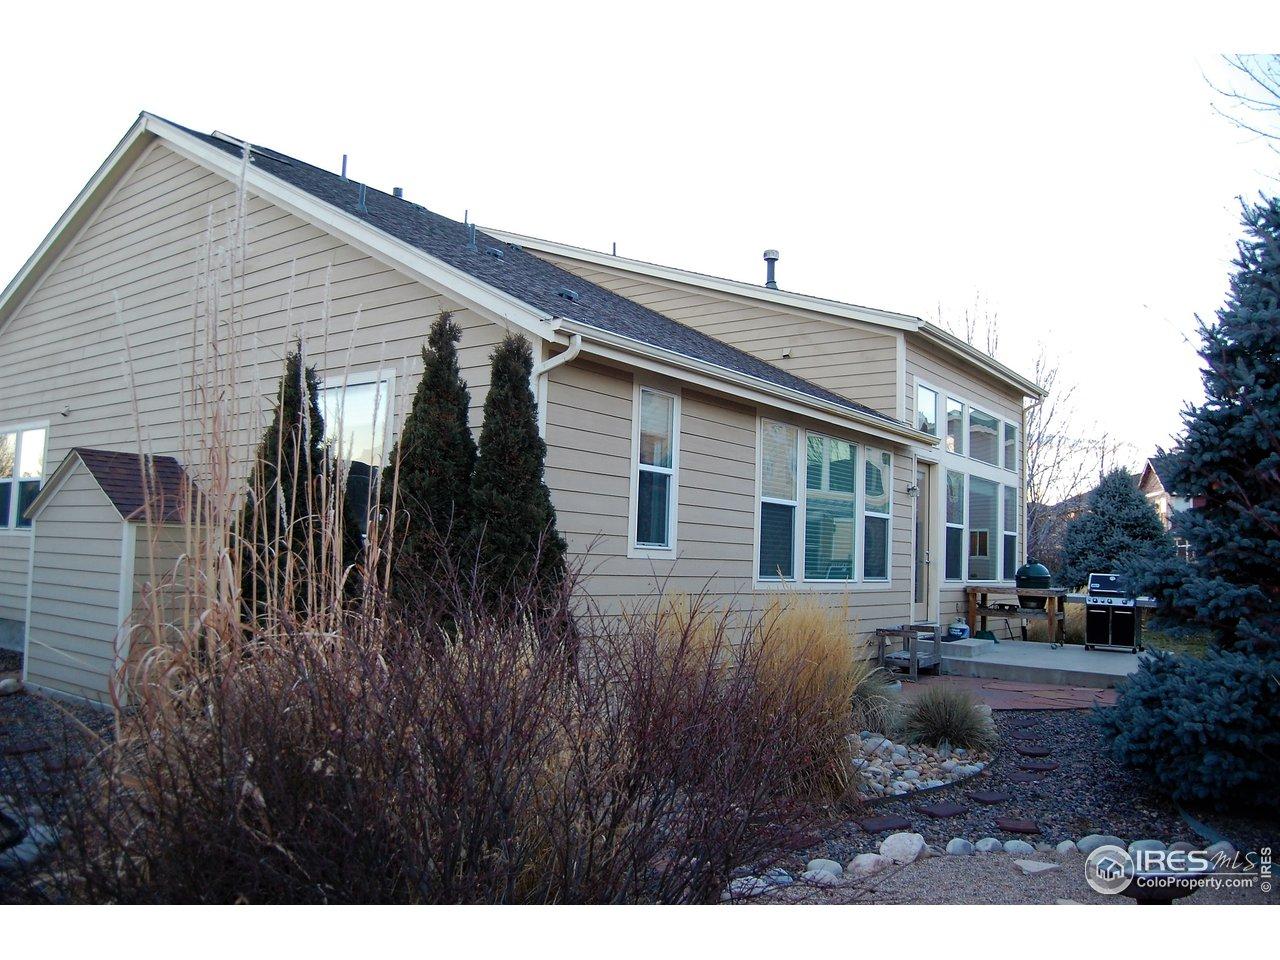 Three Season Patio and Backyard Space